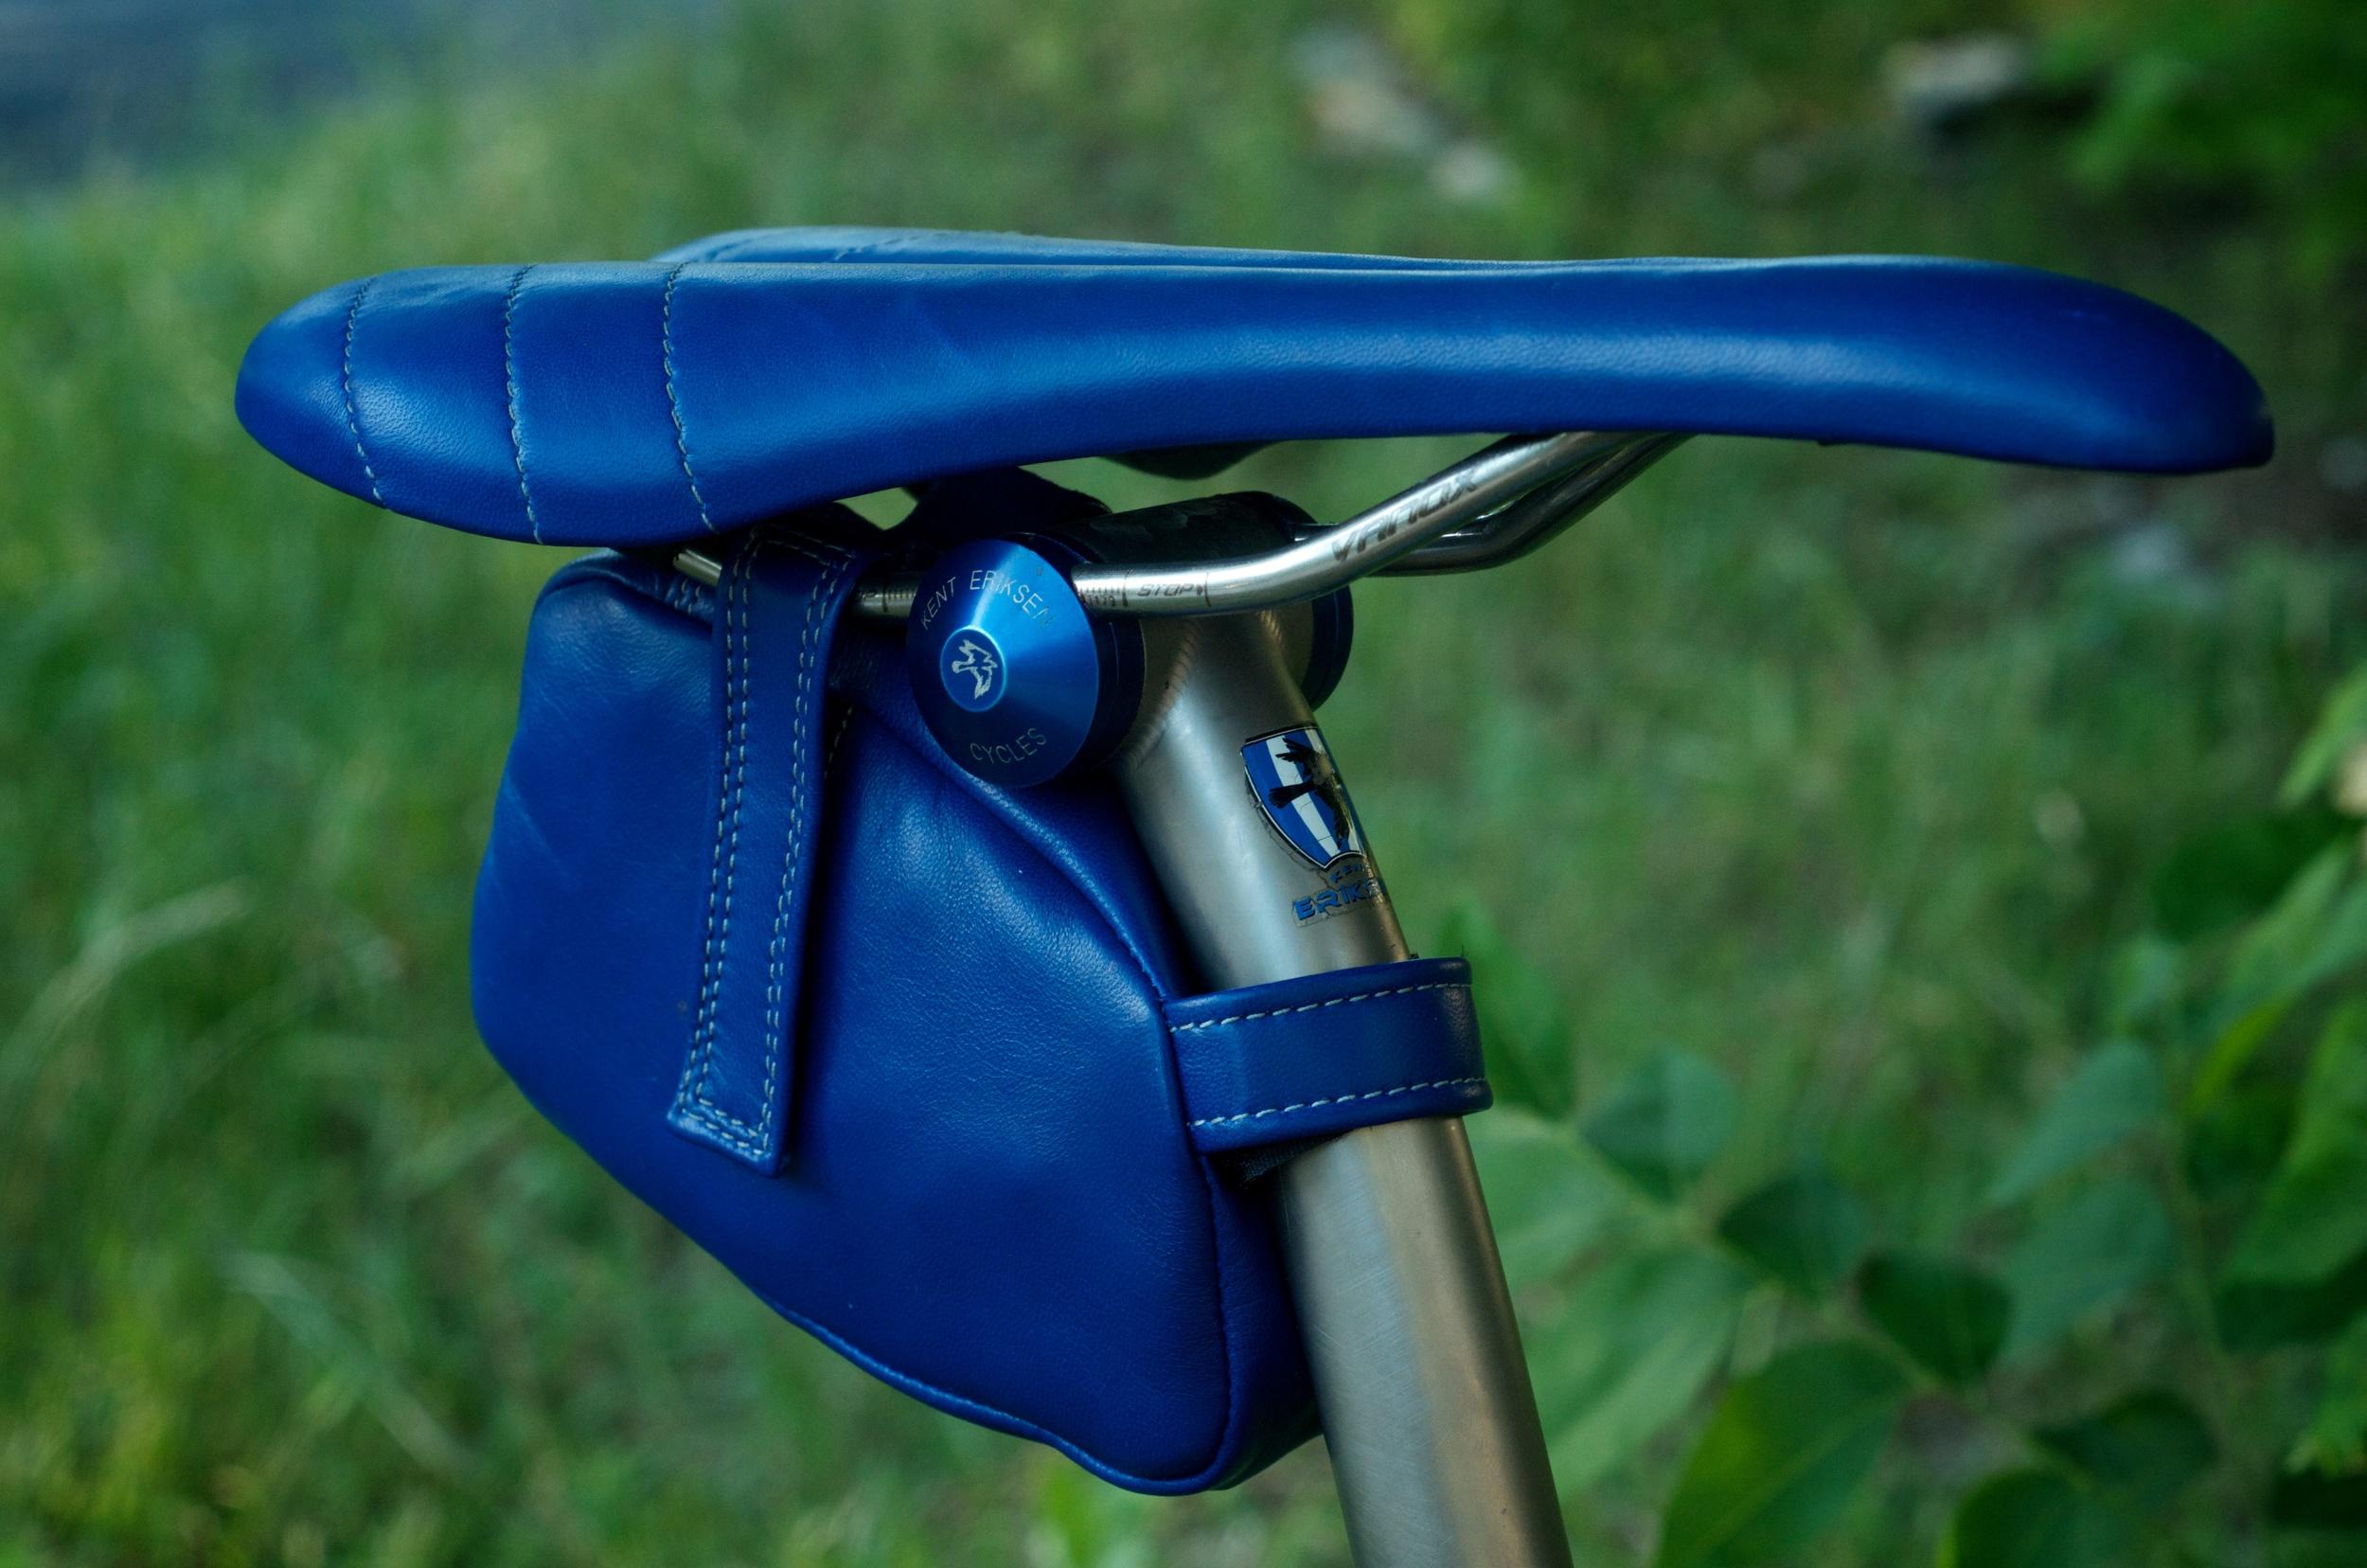 Custom-blue-leather-Selle_Italia-SLK-recover-repair-saddle-bag-handmade-Austin-texas-Willits-eriksen-vintage-brooks-busyman-grey-seat-vintage 3.jpg